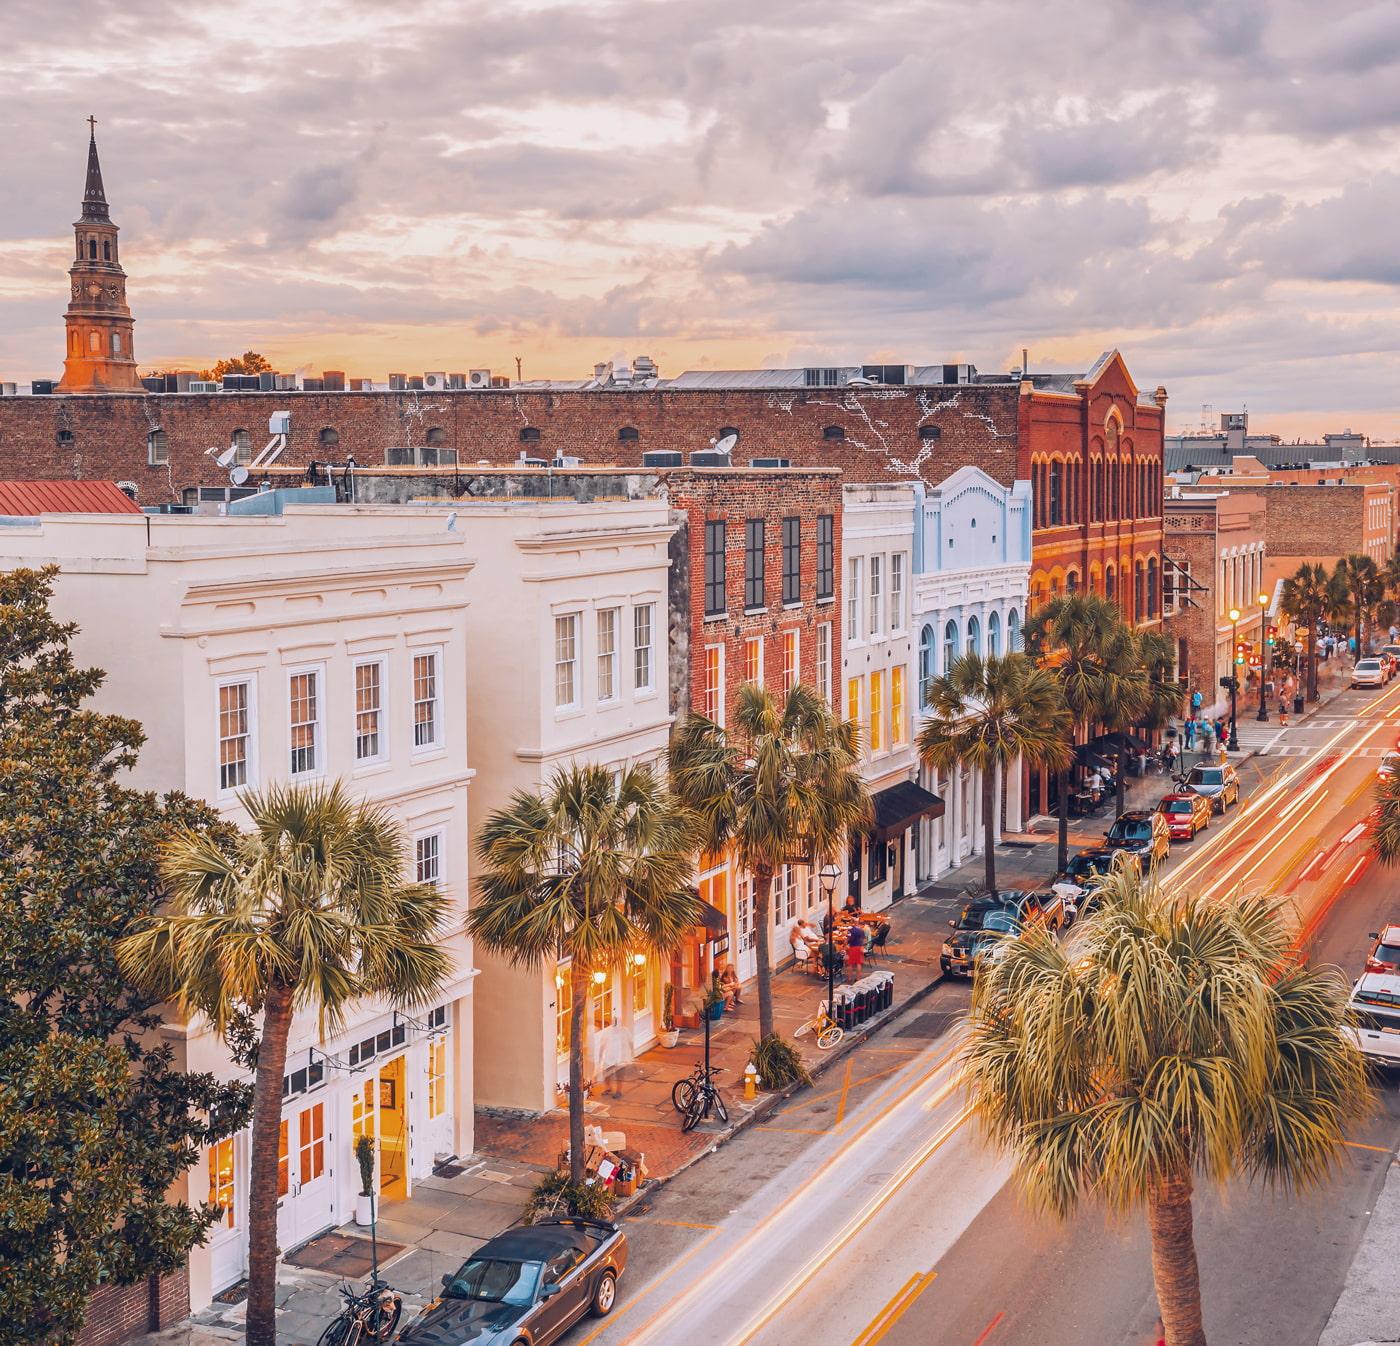 Historical architecture in Charleston